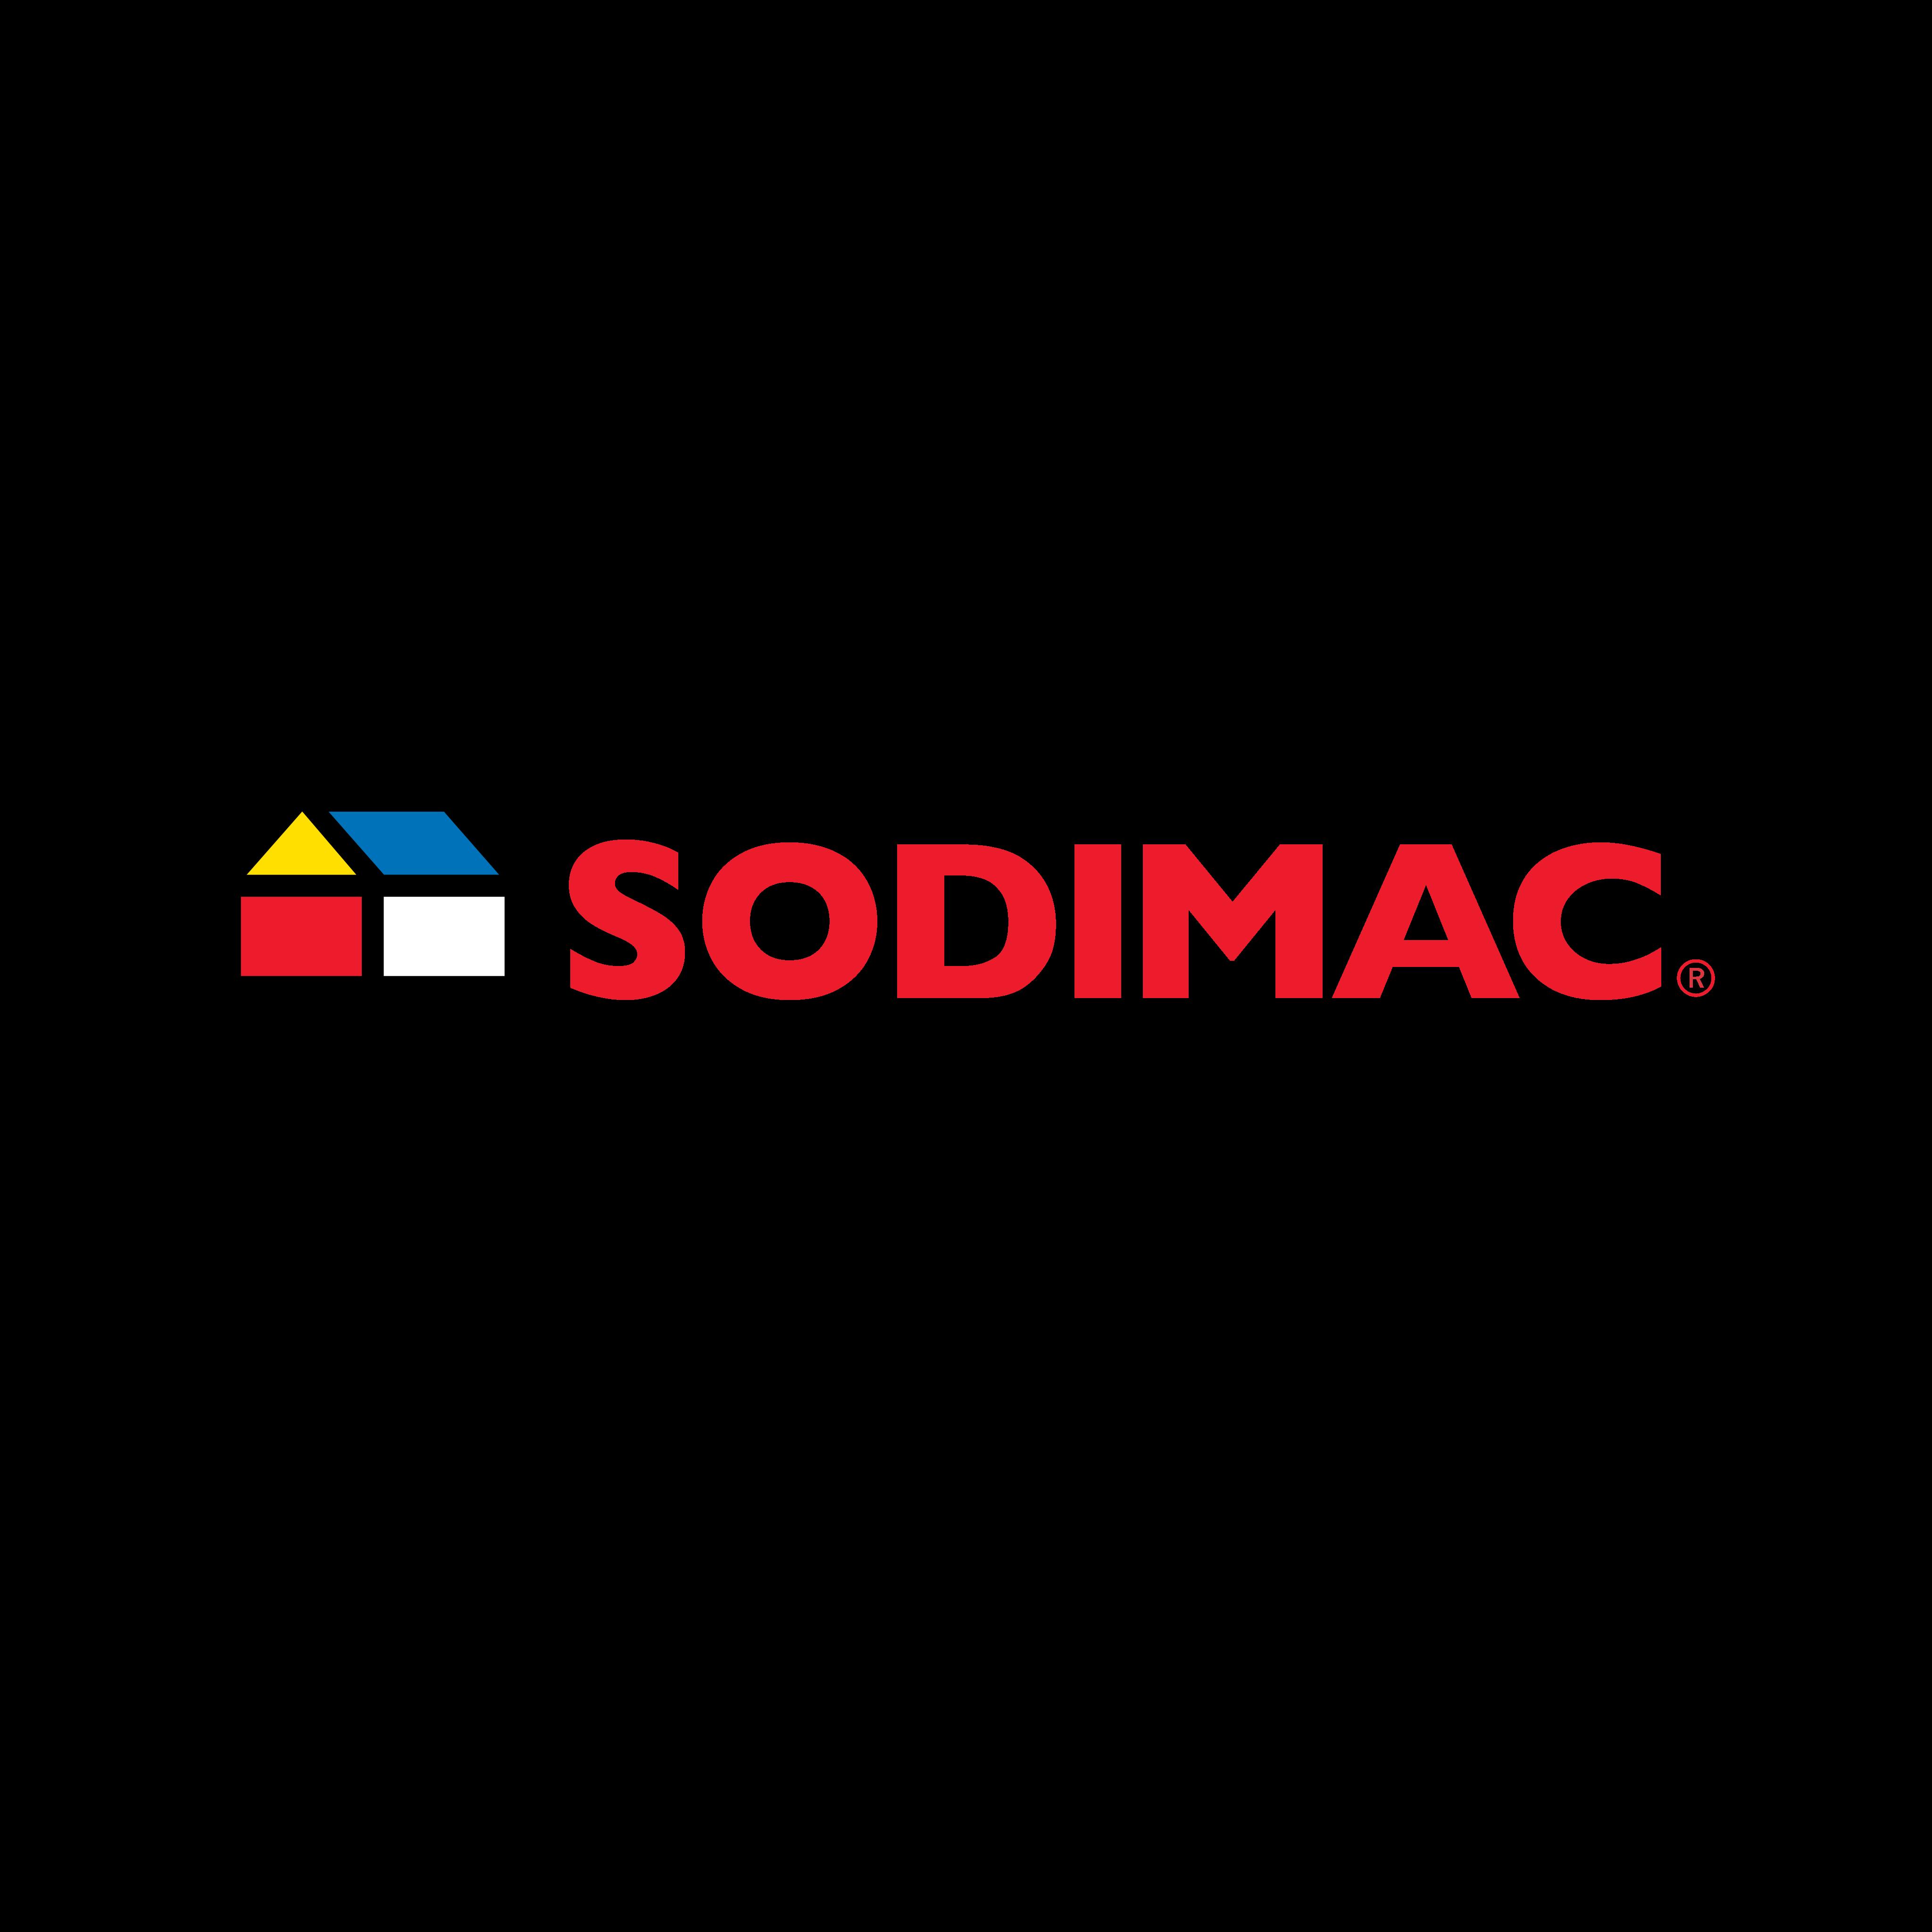 sodimac constructor logo 0 - Sodimac Constructor Logo